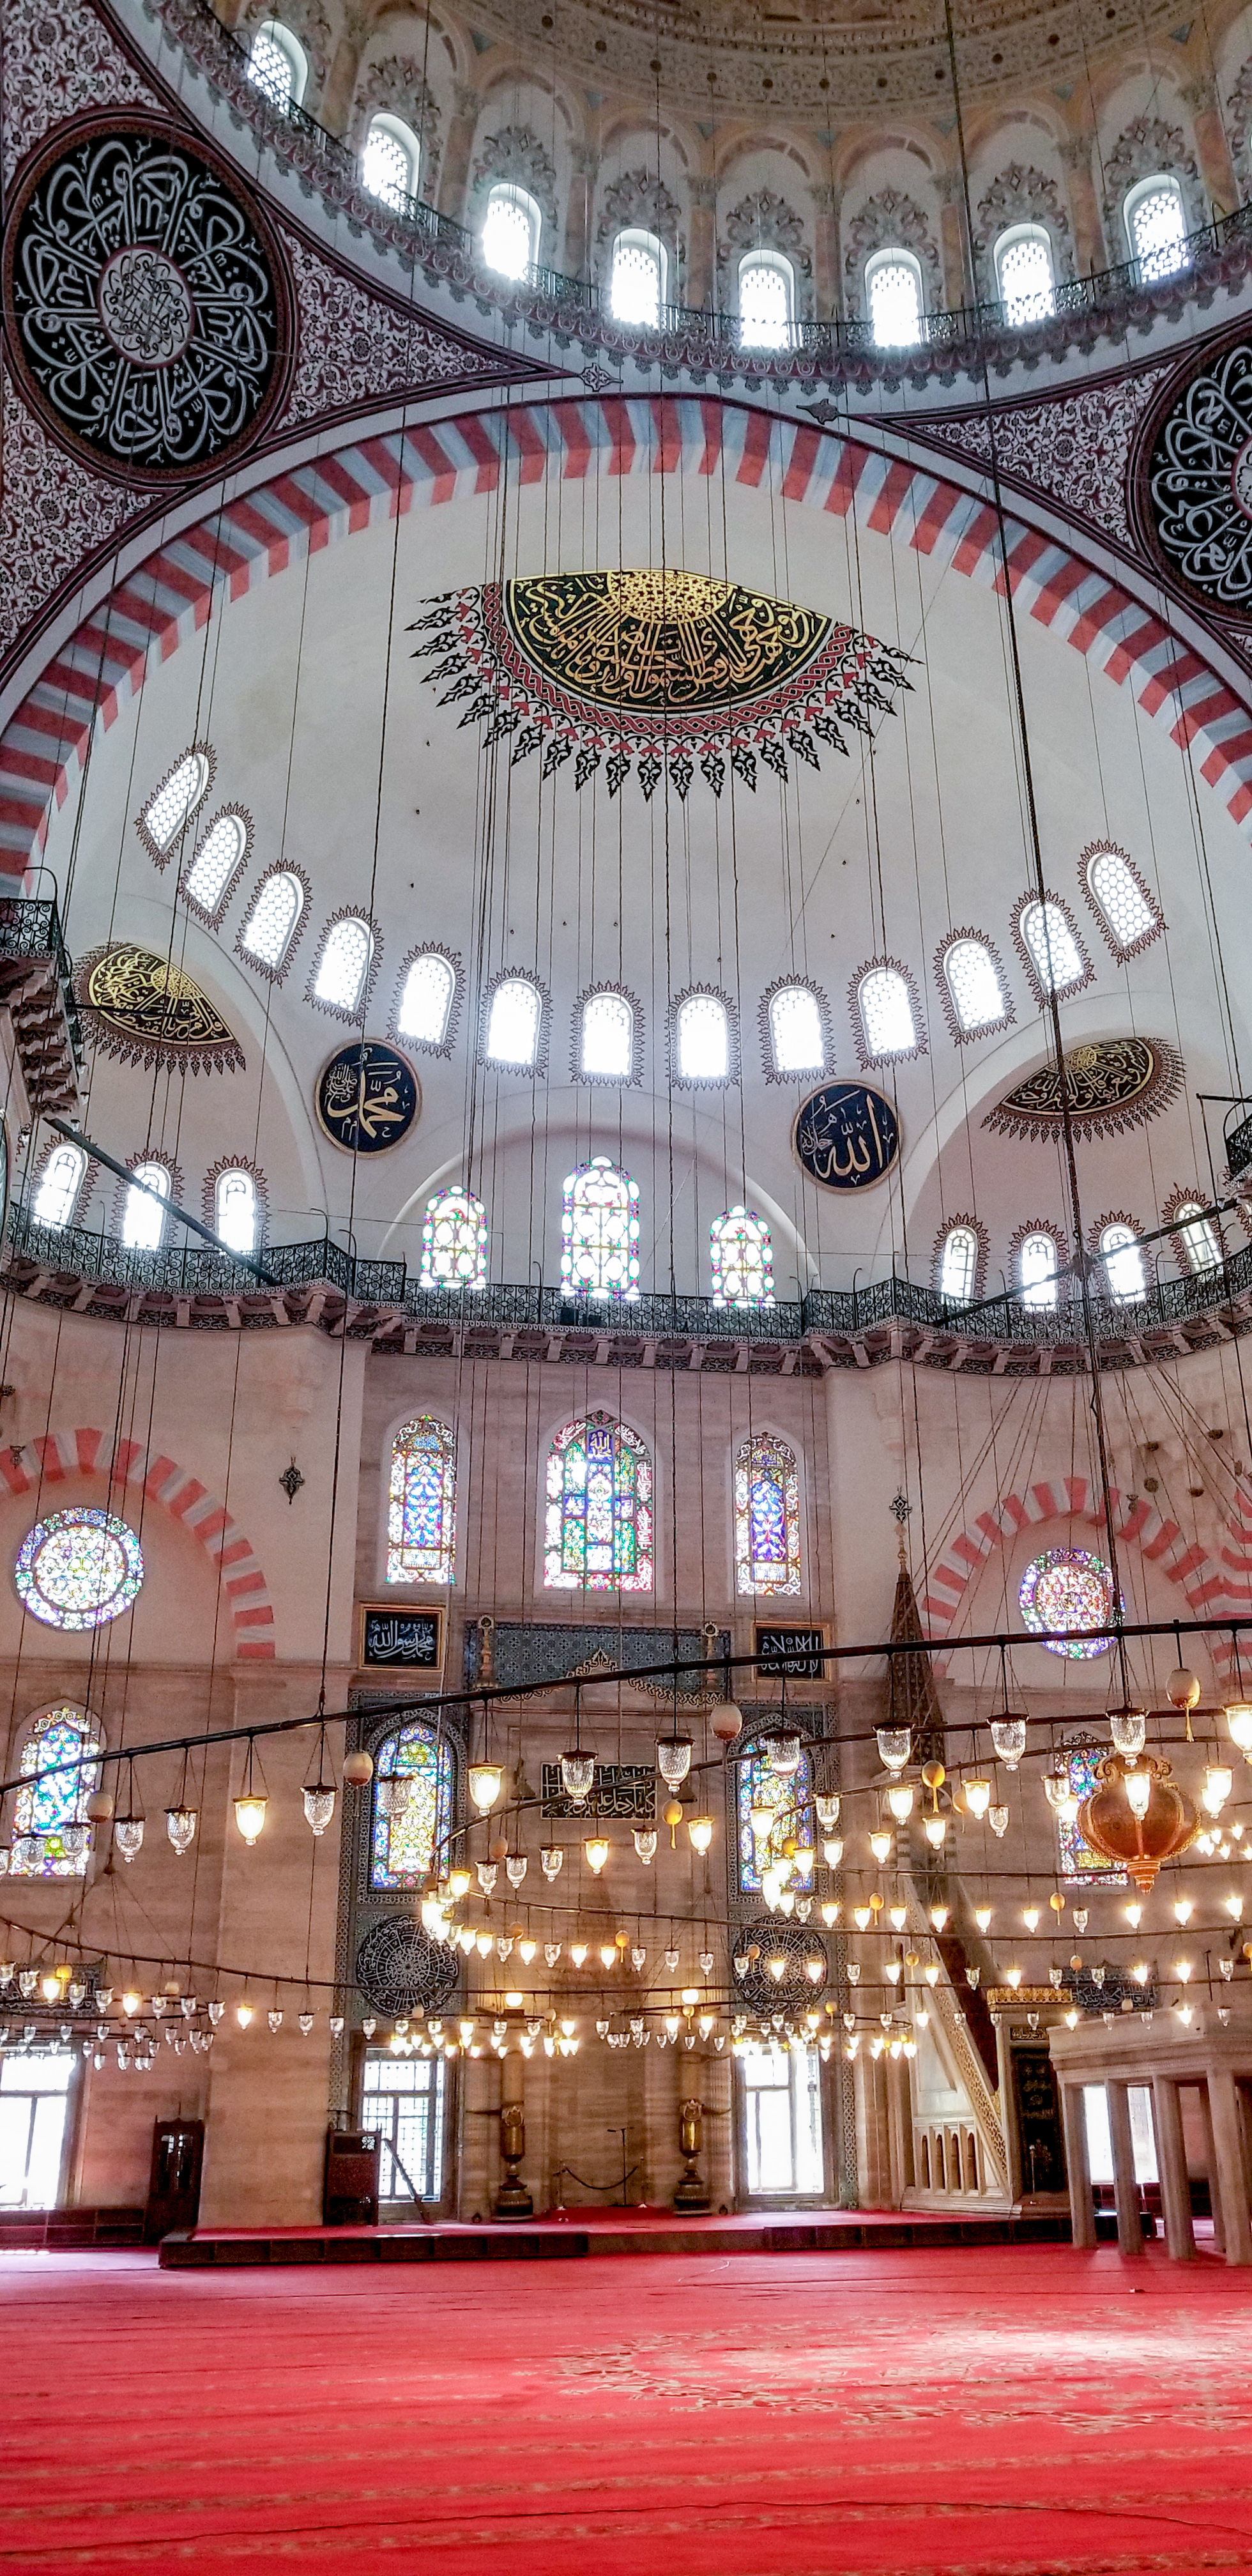 20190406 - Turkey - 0025-7.JPG